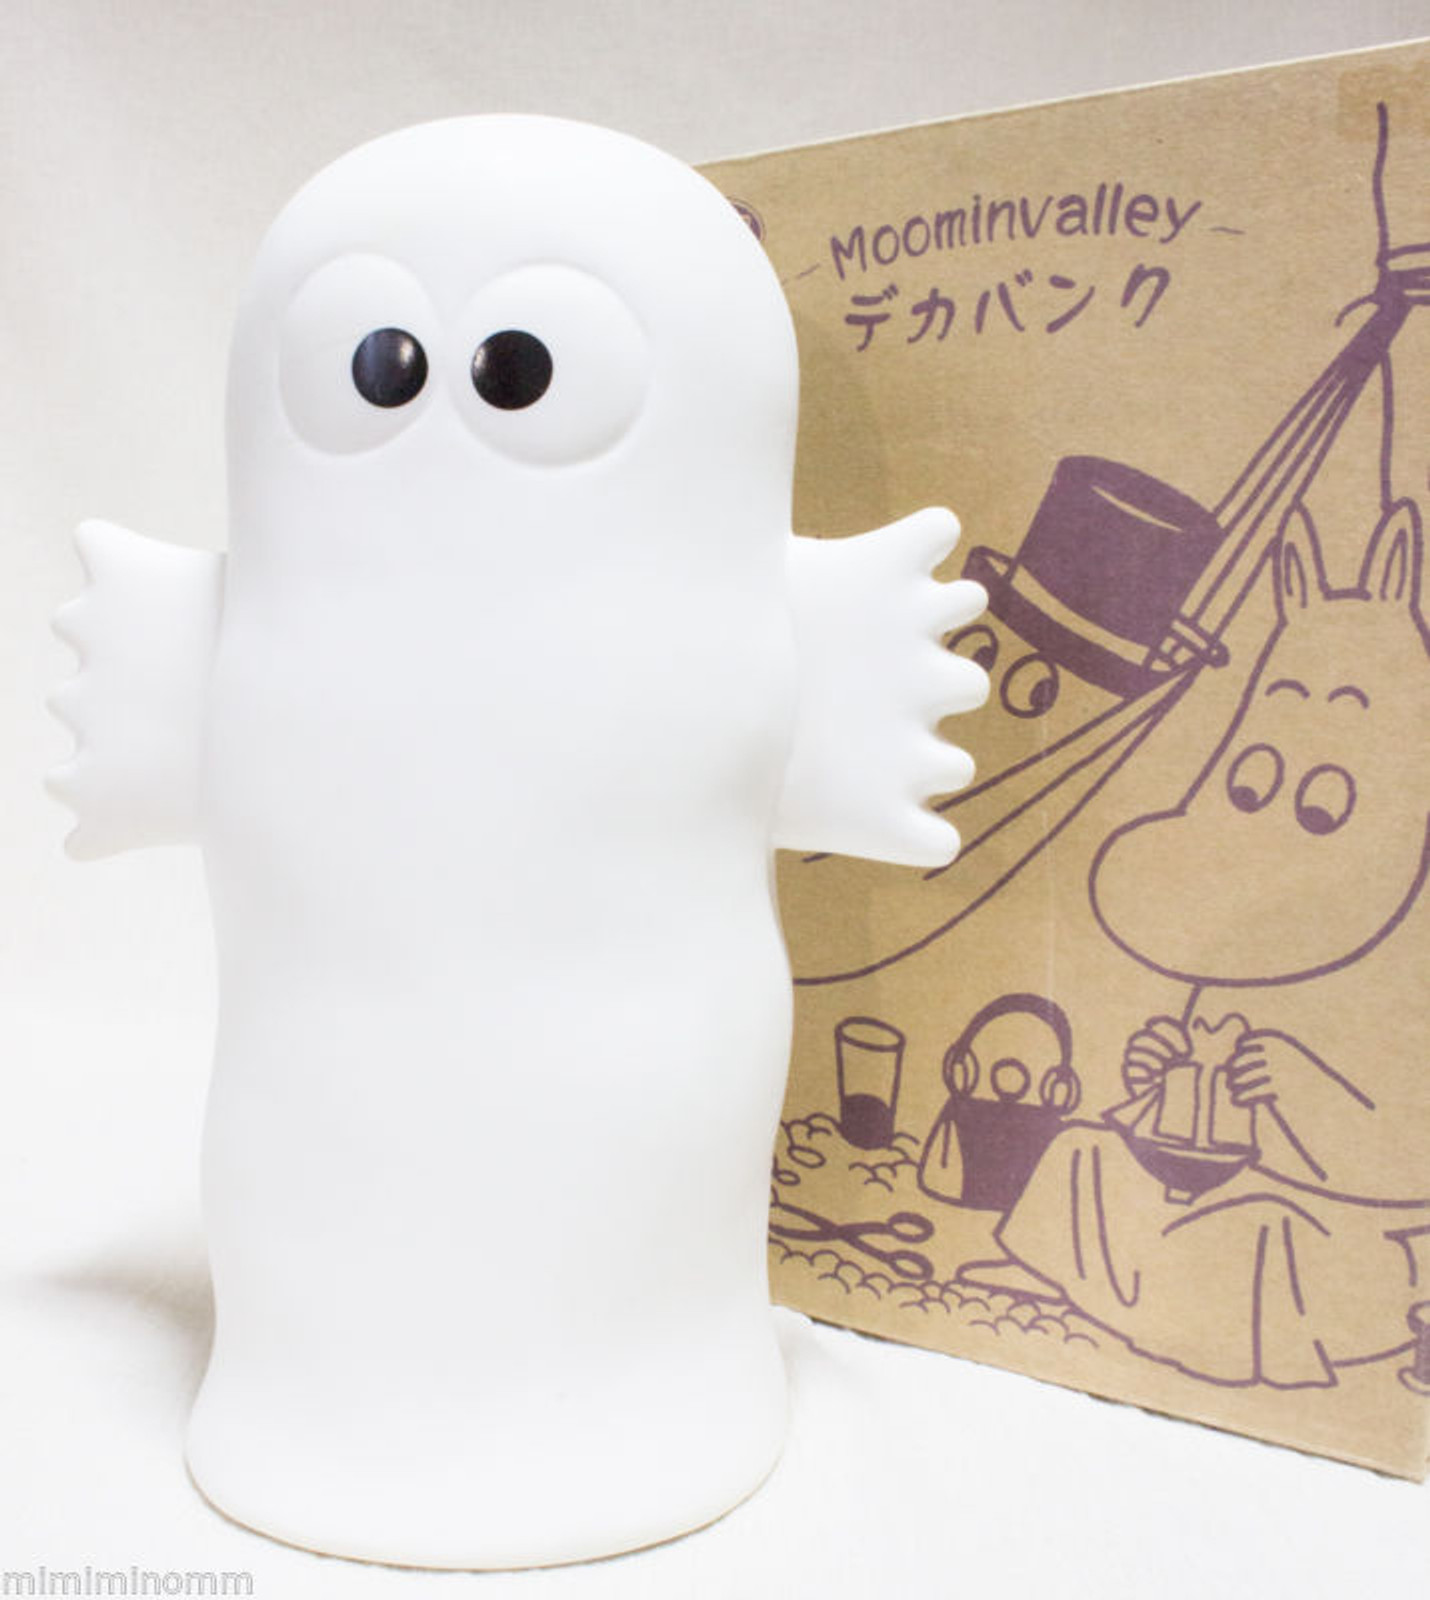 "Moomin Valley Nyoro Nyoro 9"" Big Coin Bank Figure JAPAN ANIME"